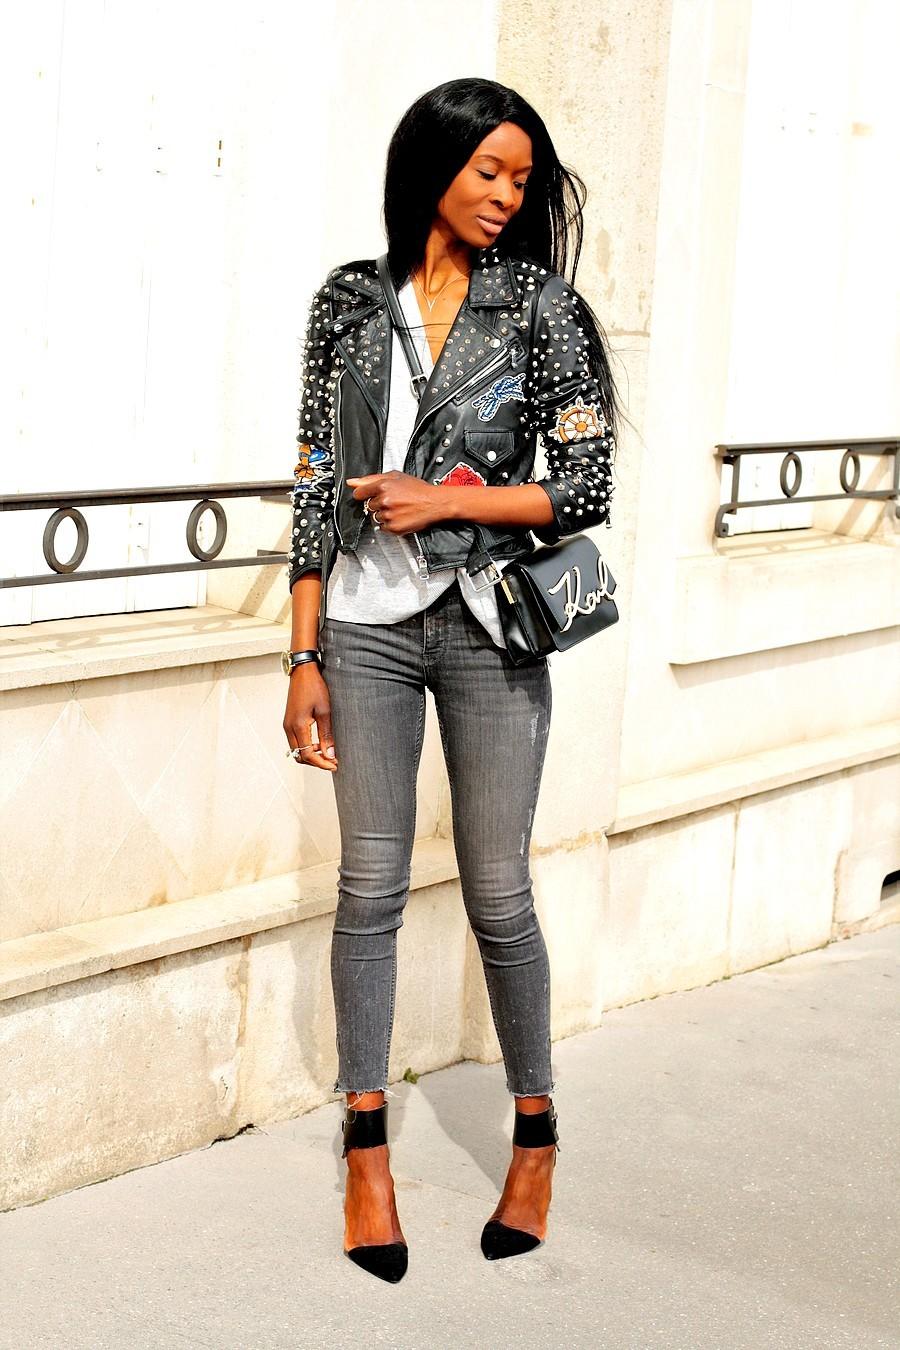 sac-karl-lagerfeld-perfecto-cuir-zara-jeans-dechire